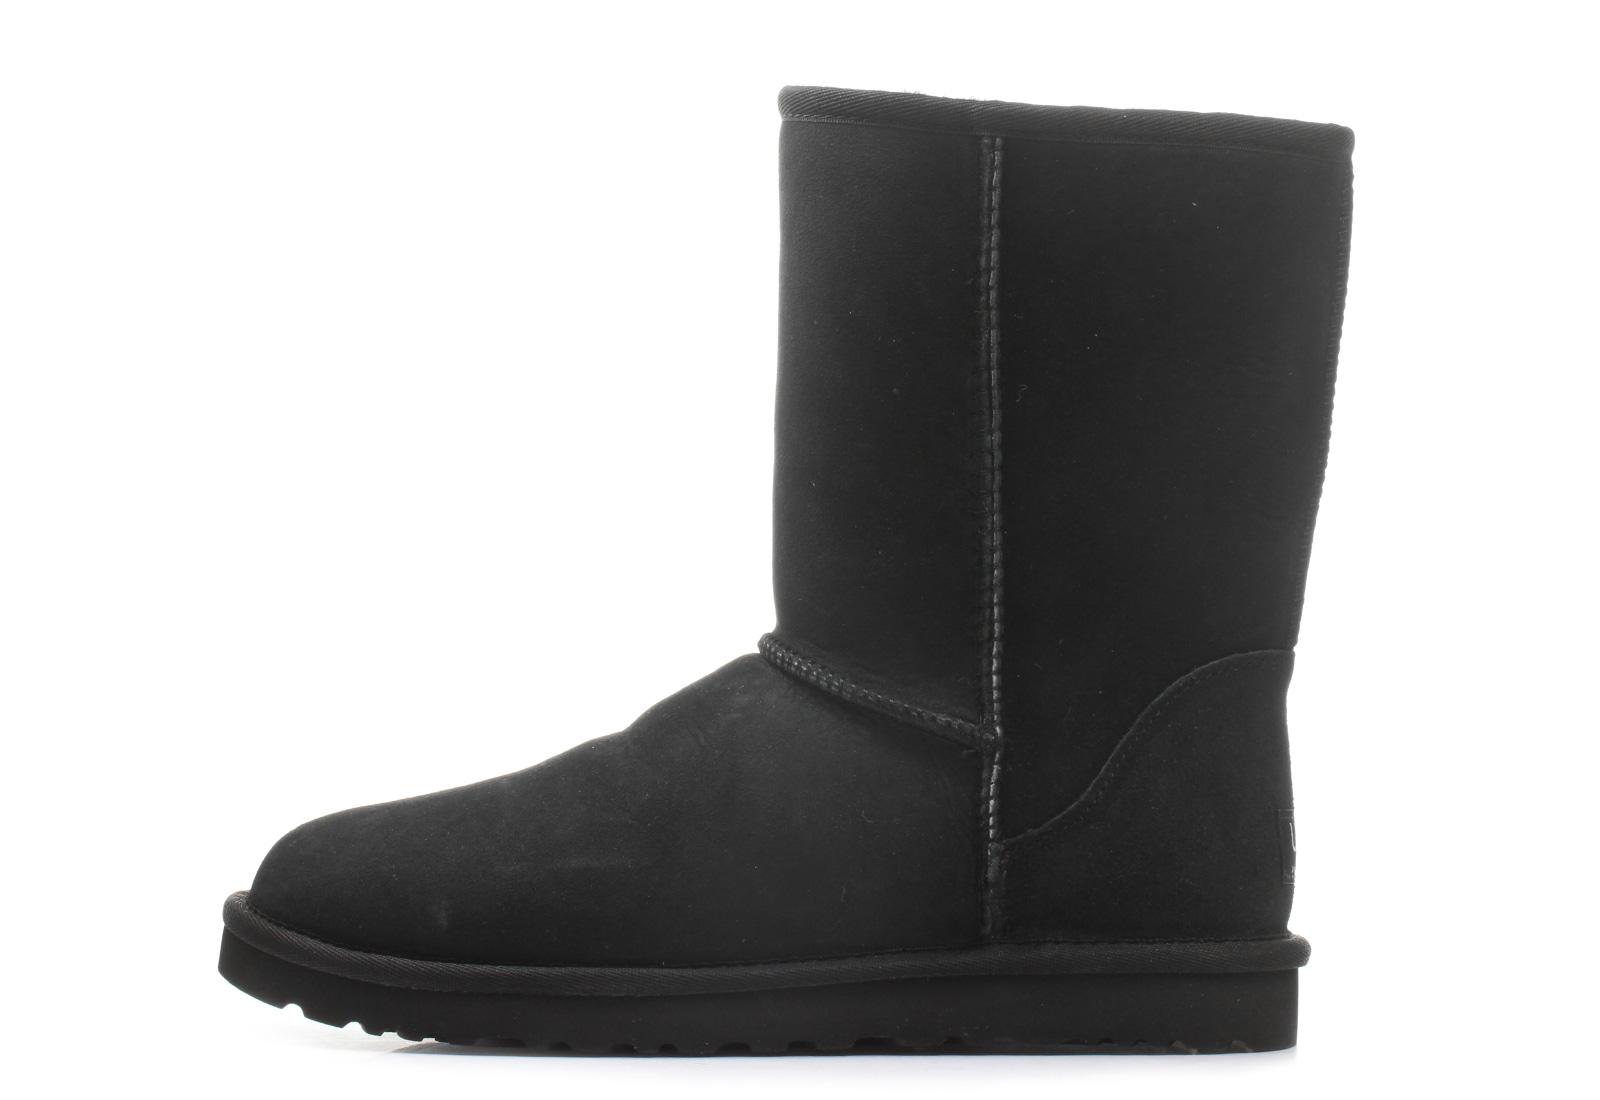 UGG Short Classic 5800 Sand Boots